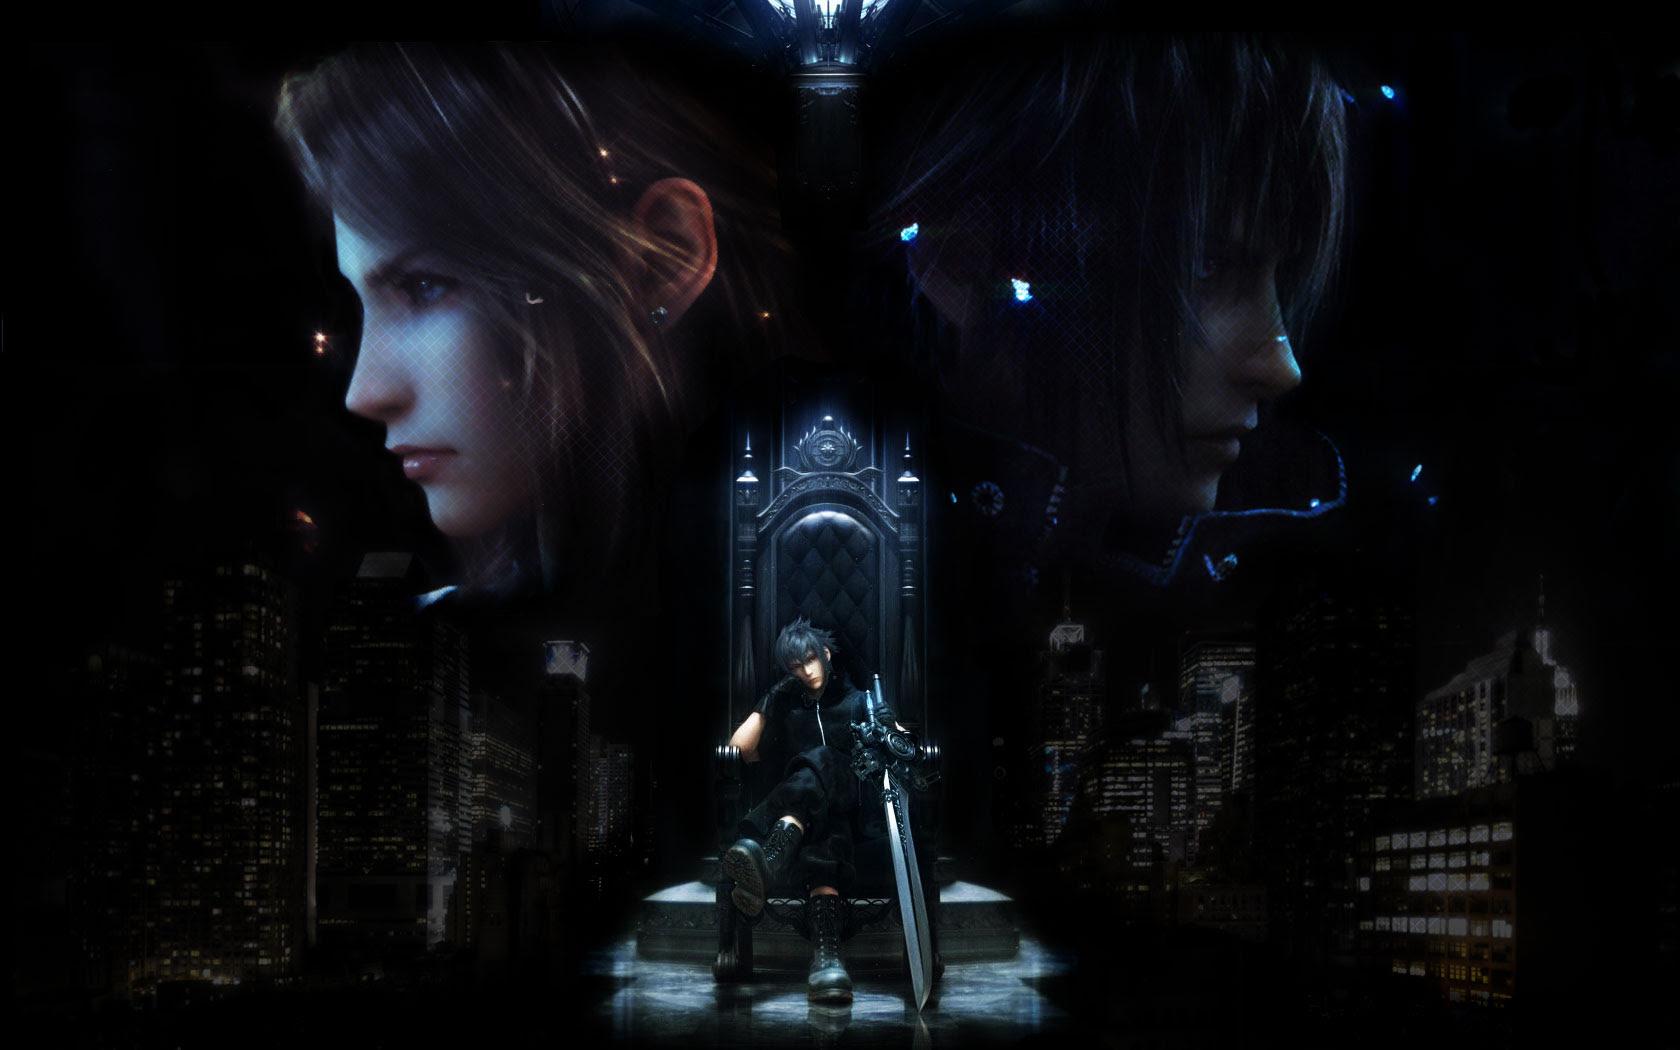 Final Fantasy Xiii Wallpaper Versus Minitokyo